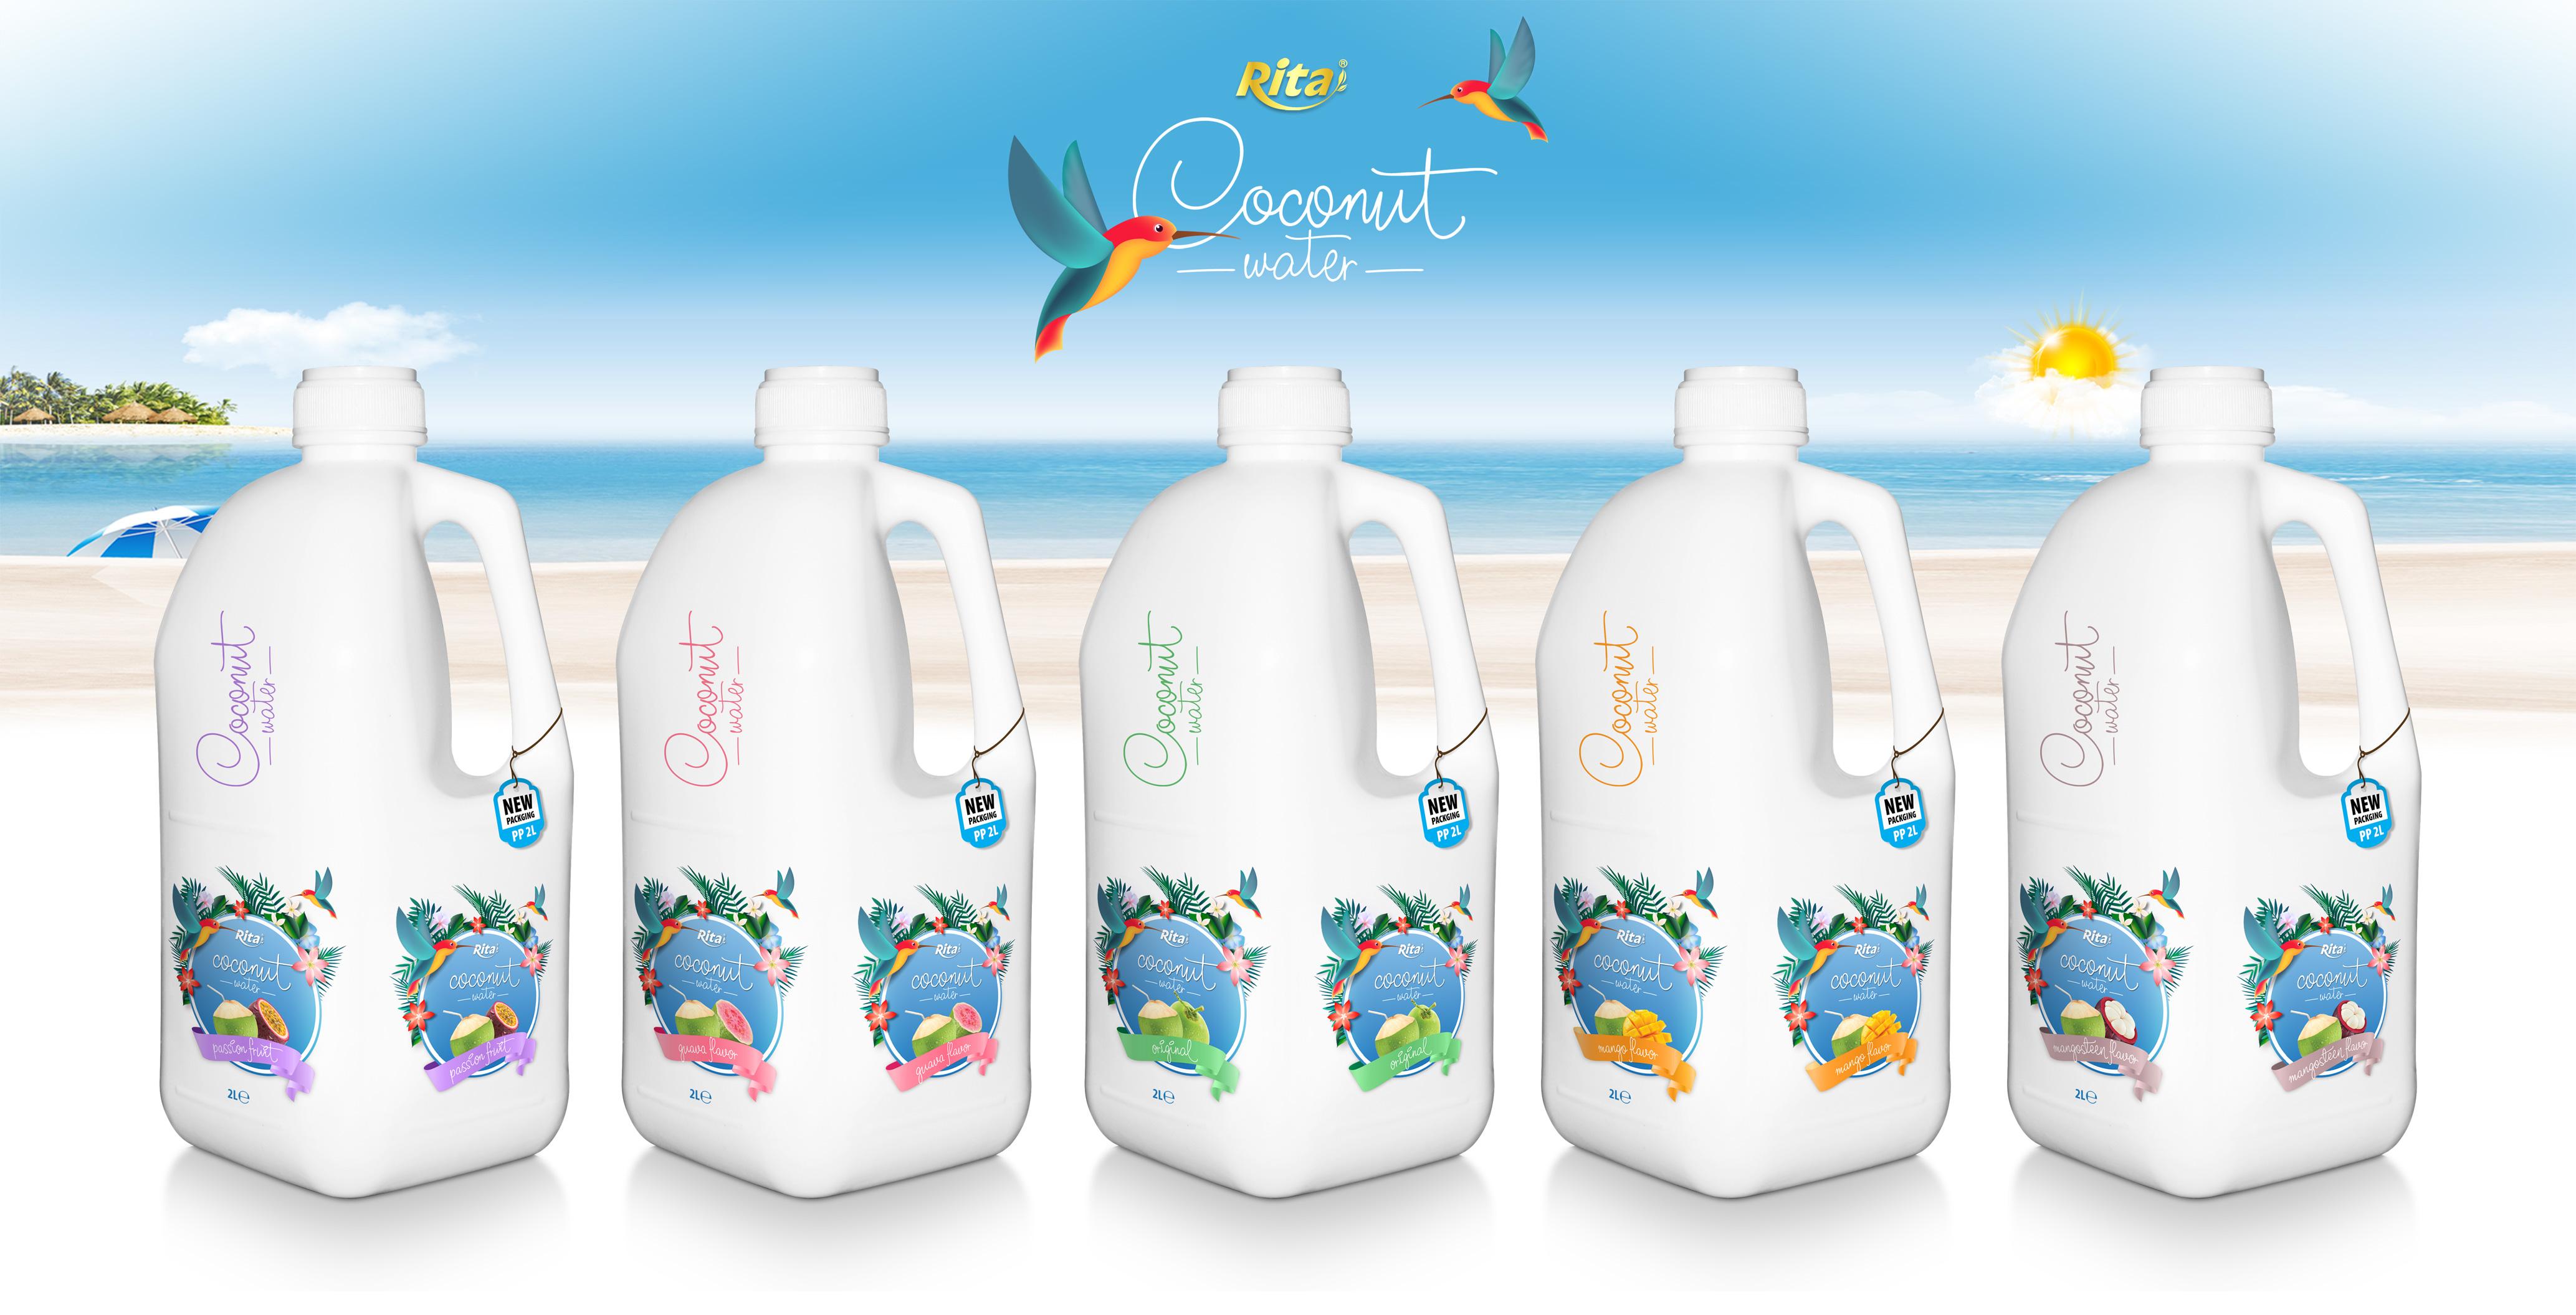 Coconut water original nutrition facts